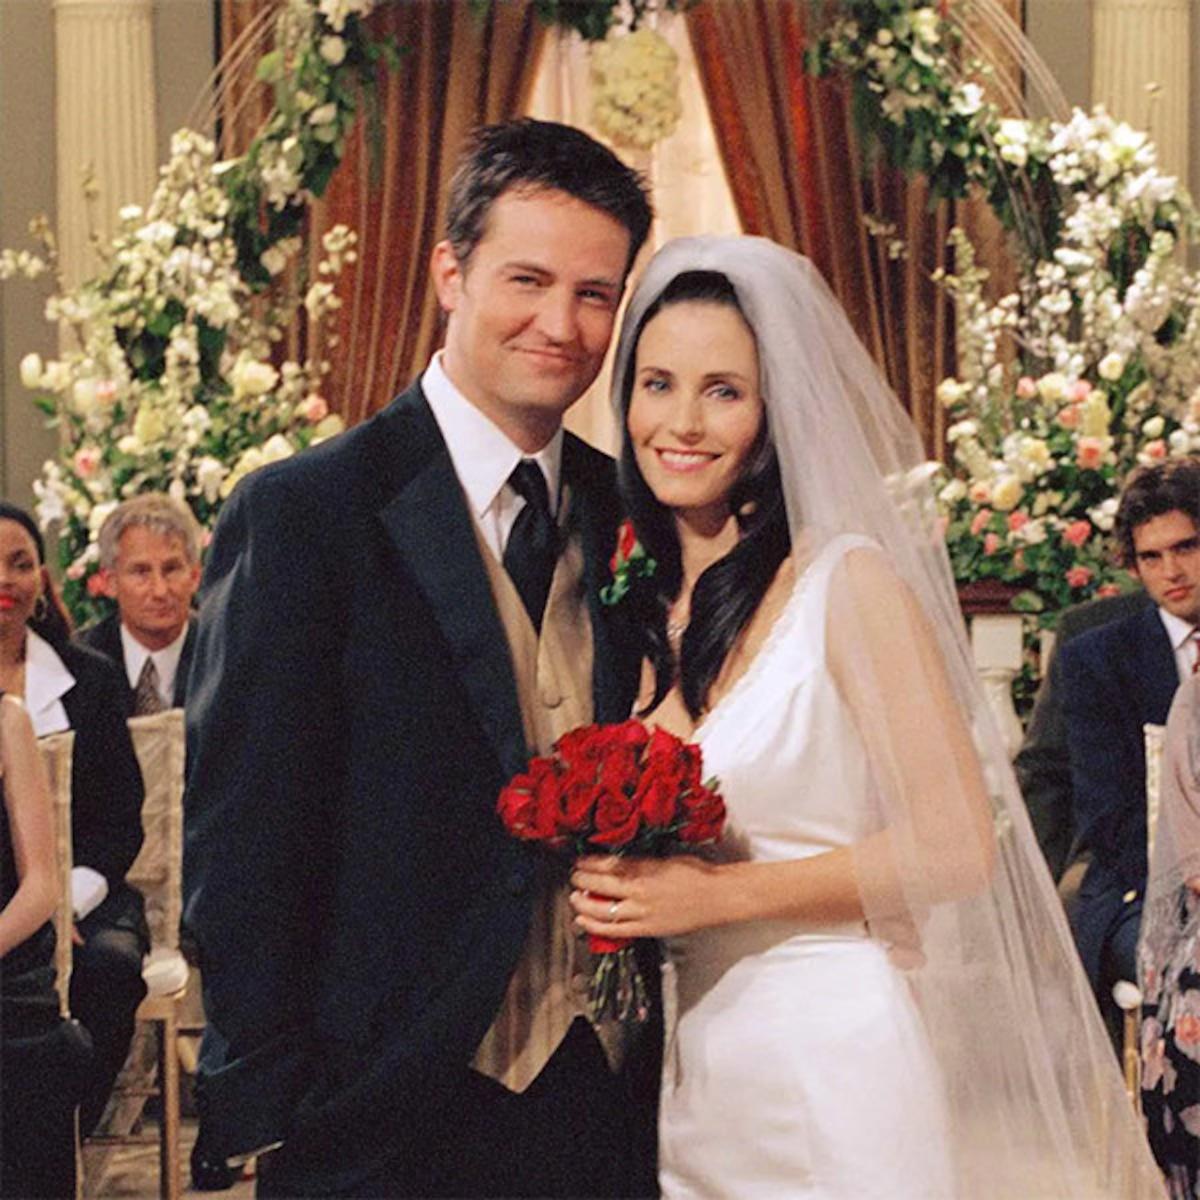 Happy Anniversary Monica & Chandler: Revisit Friends Romance - E! Online